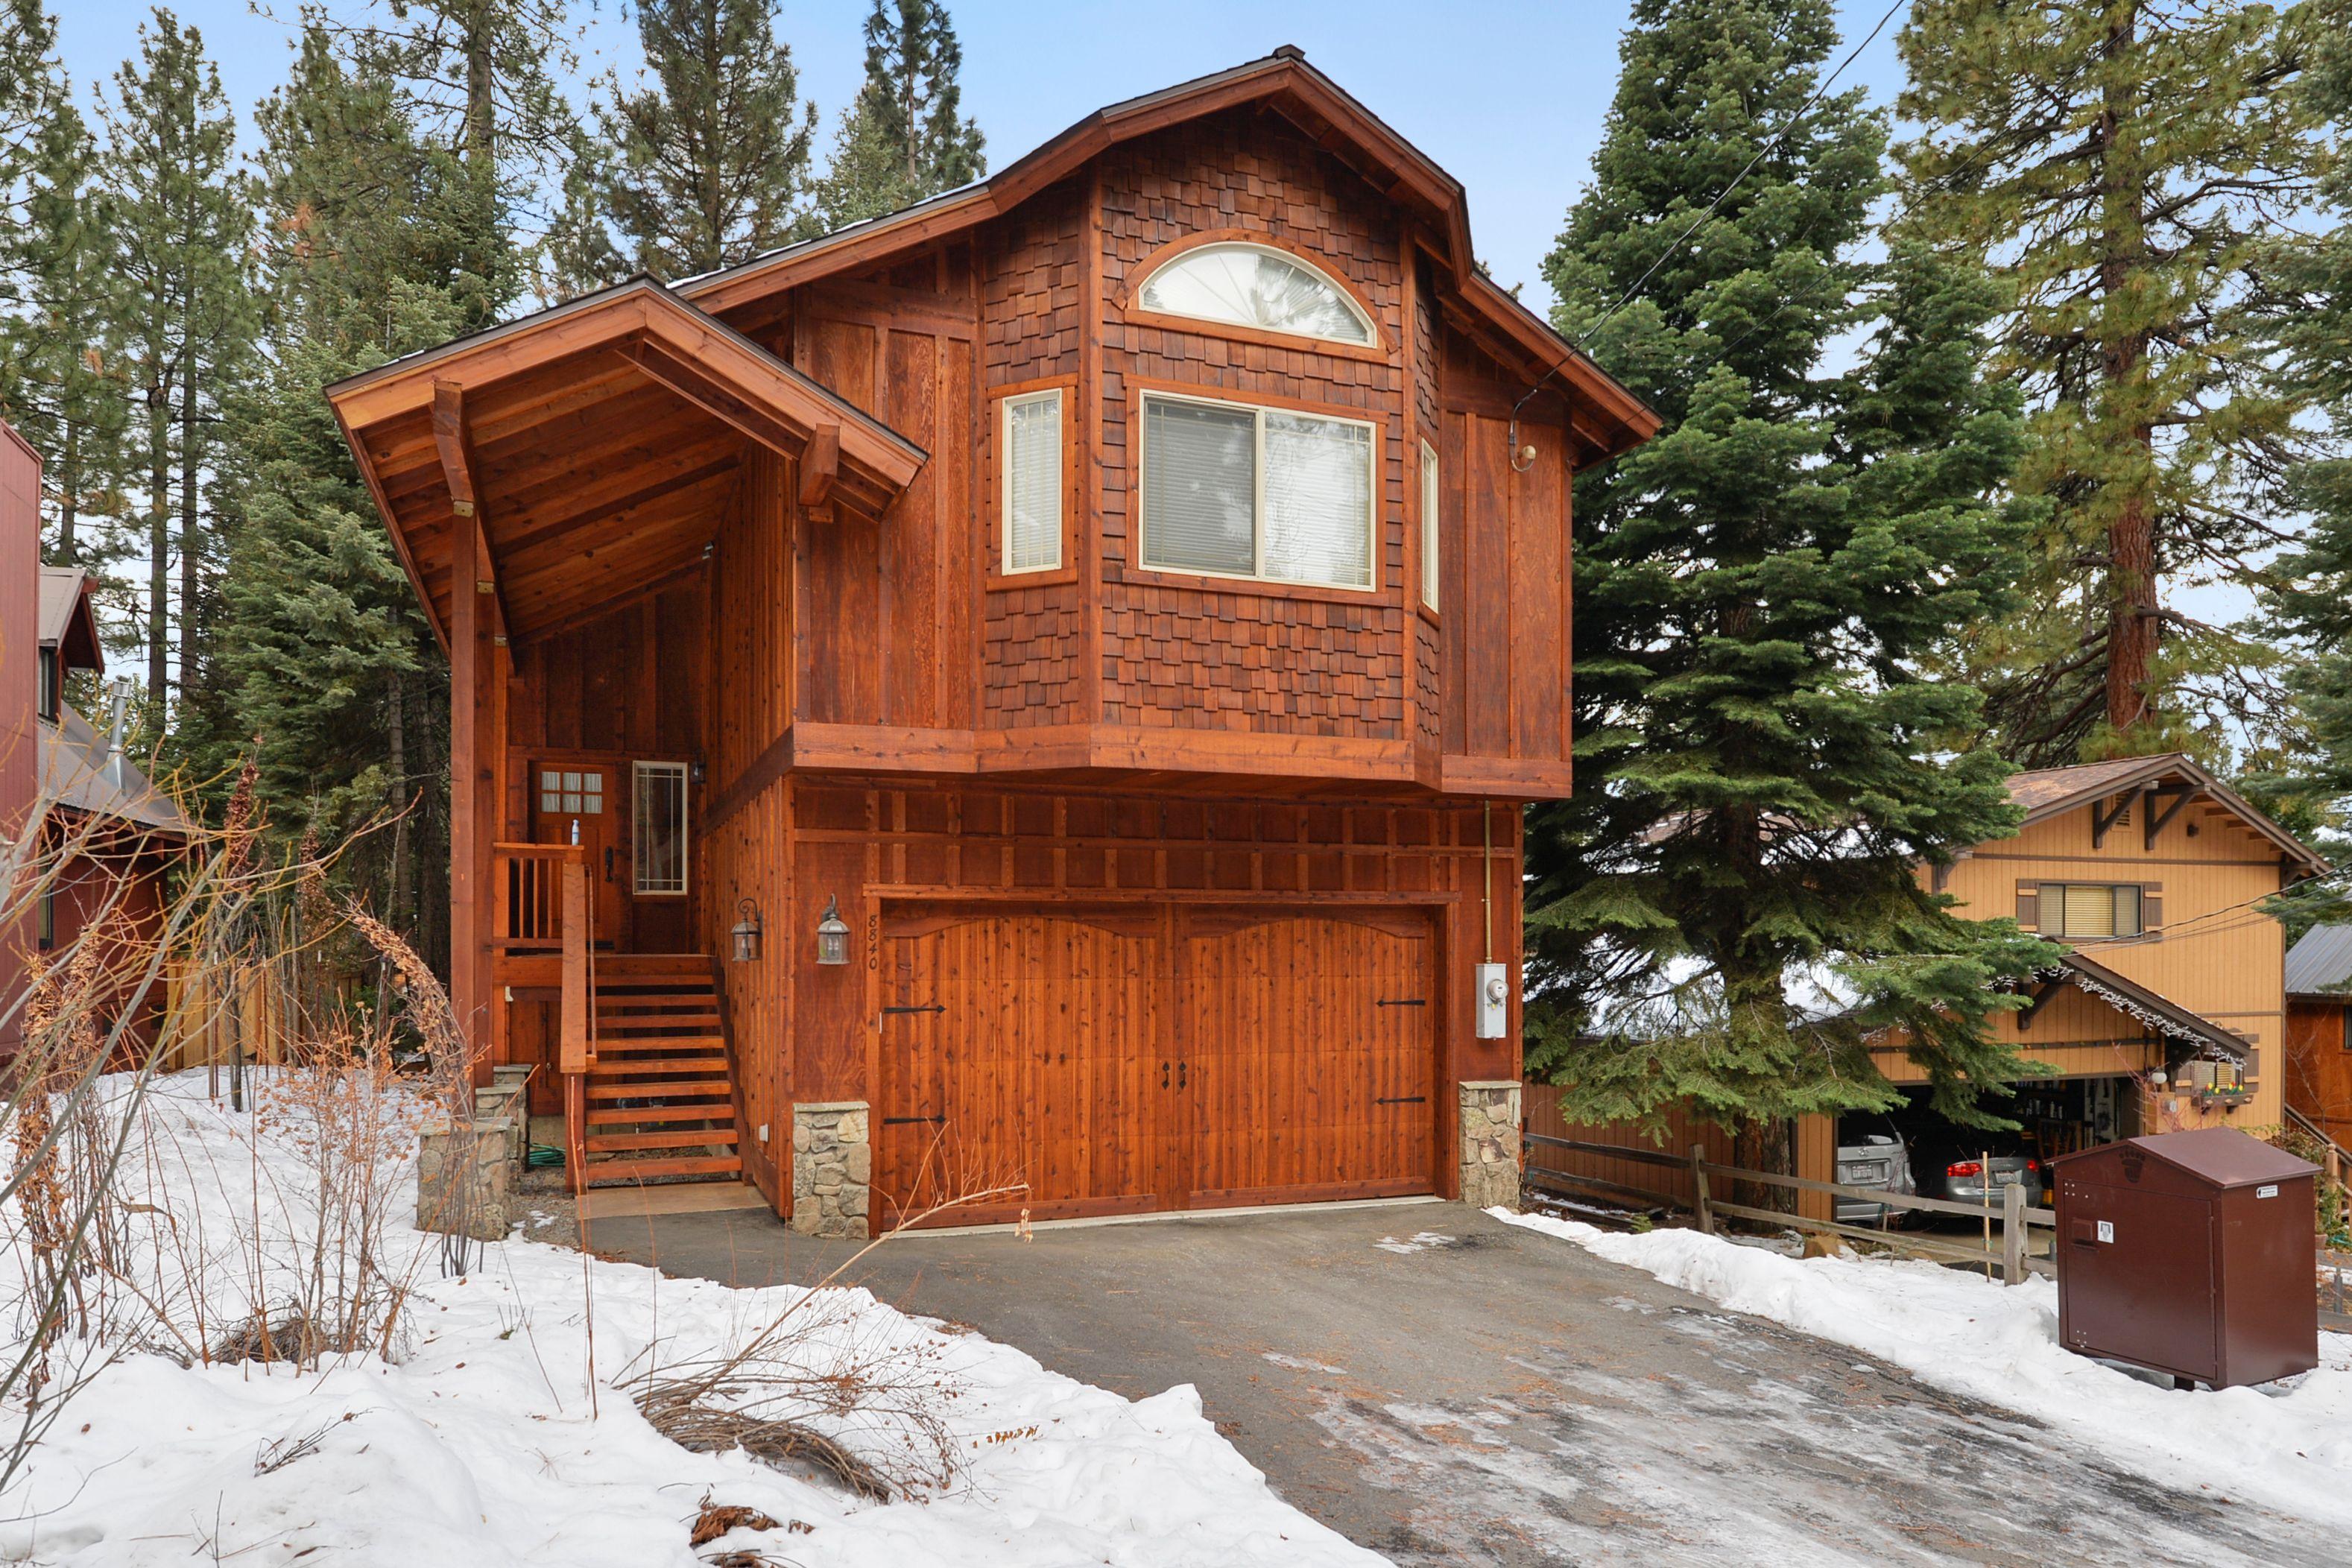 beaver view retreat lake vacation cabins rental rentals tahoe